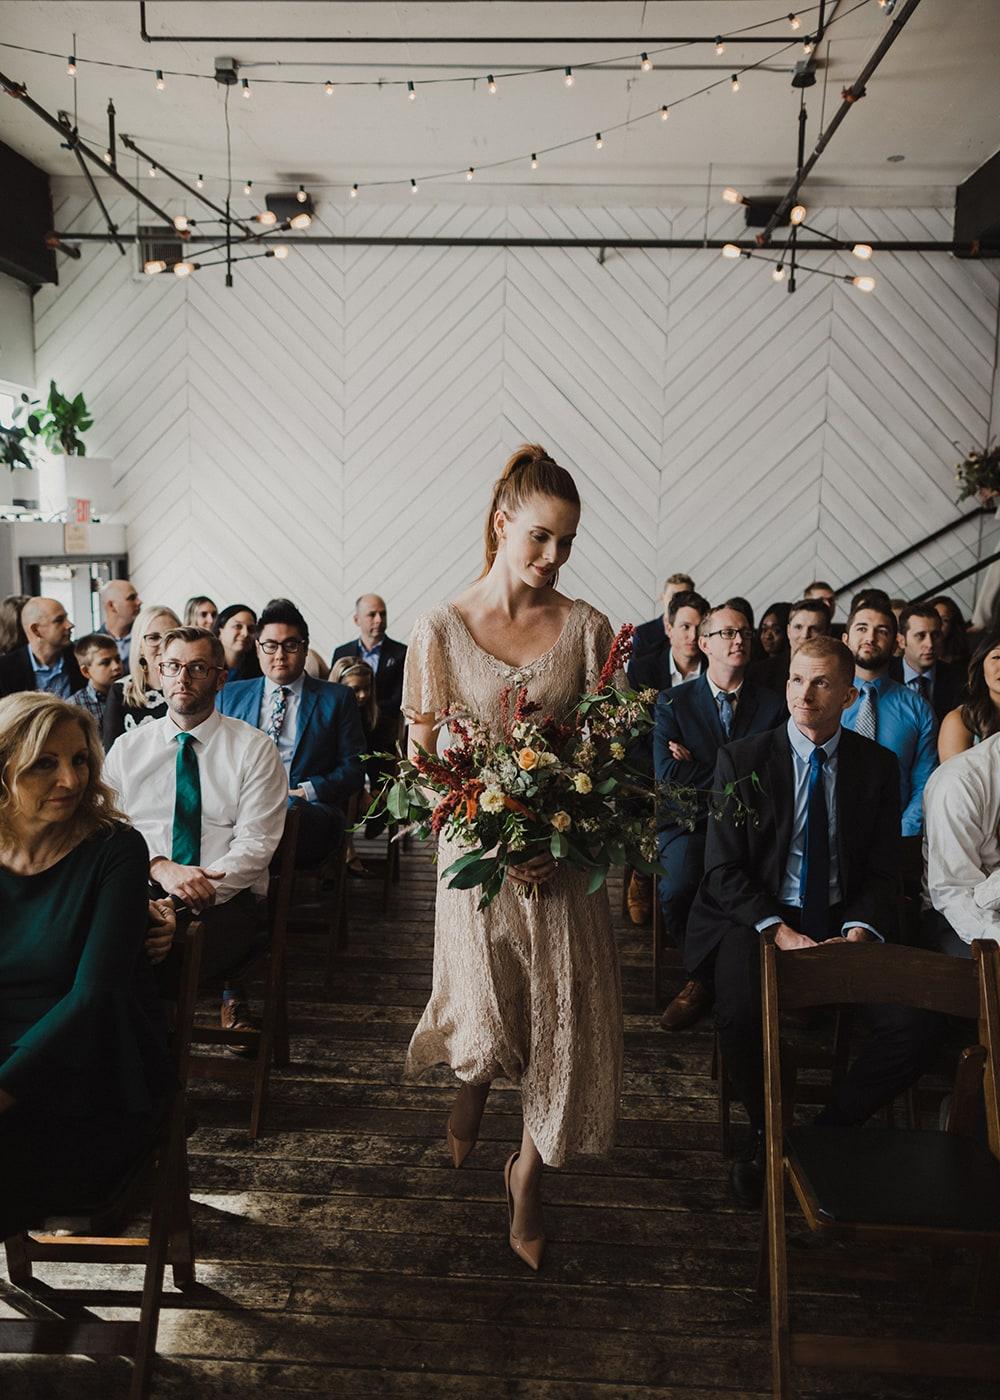 bridesmaid smiling looking down at flowers walking down isle